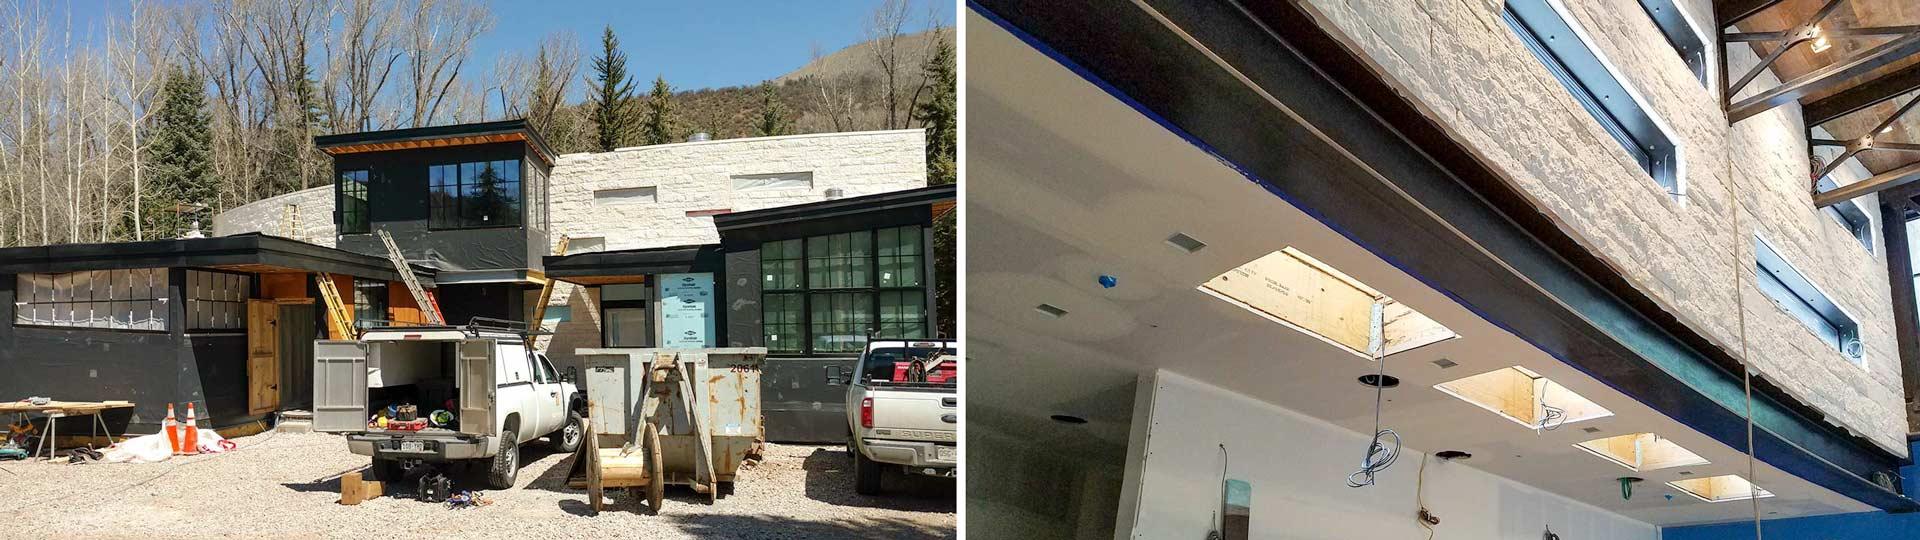 new skylights Aspen home 24205